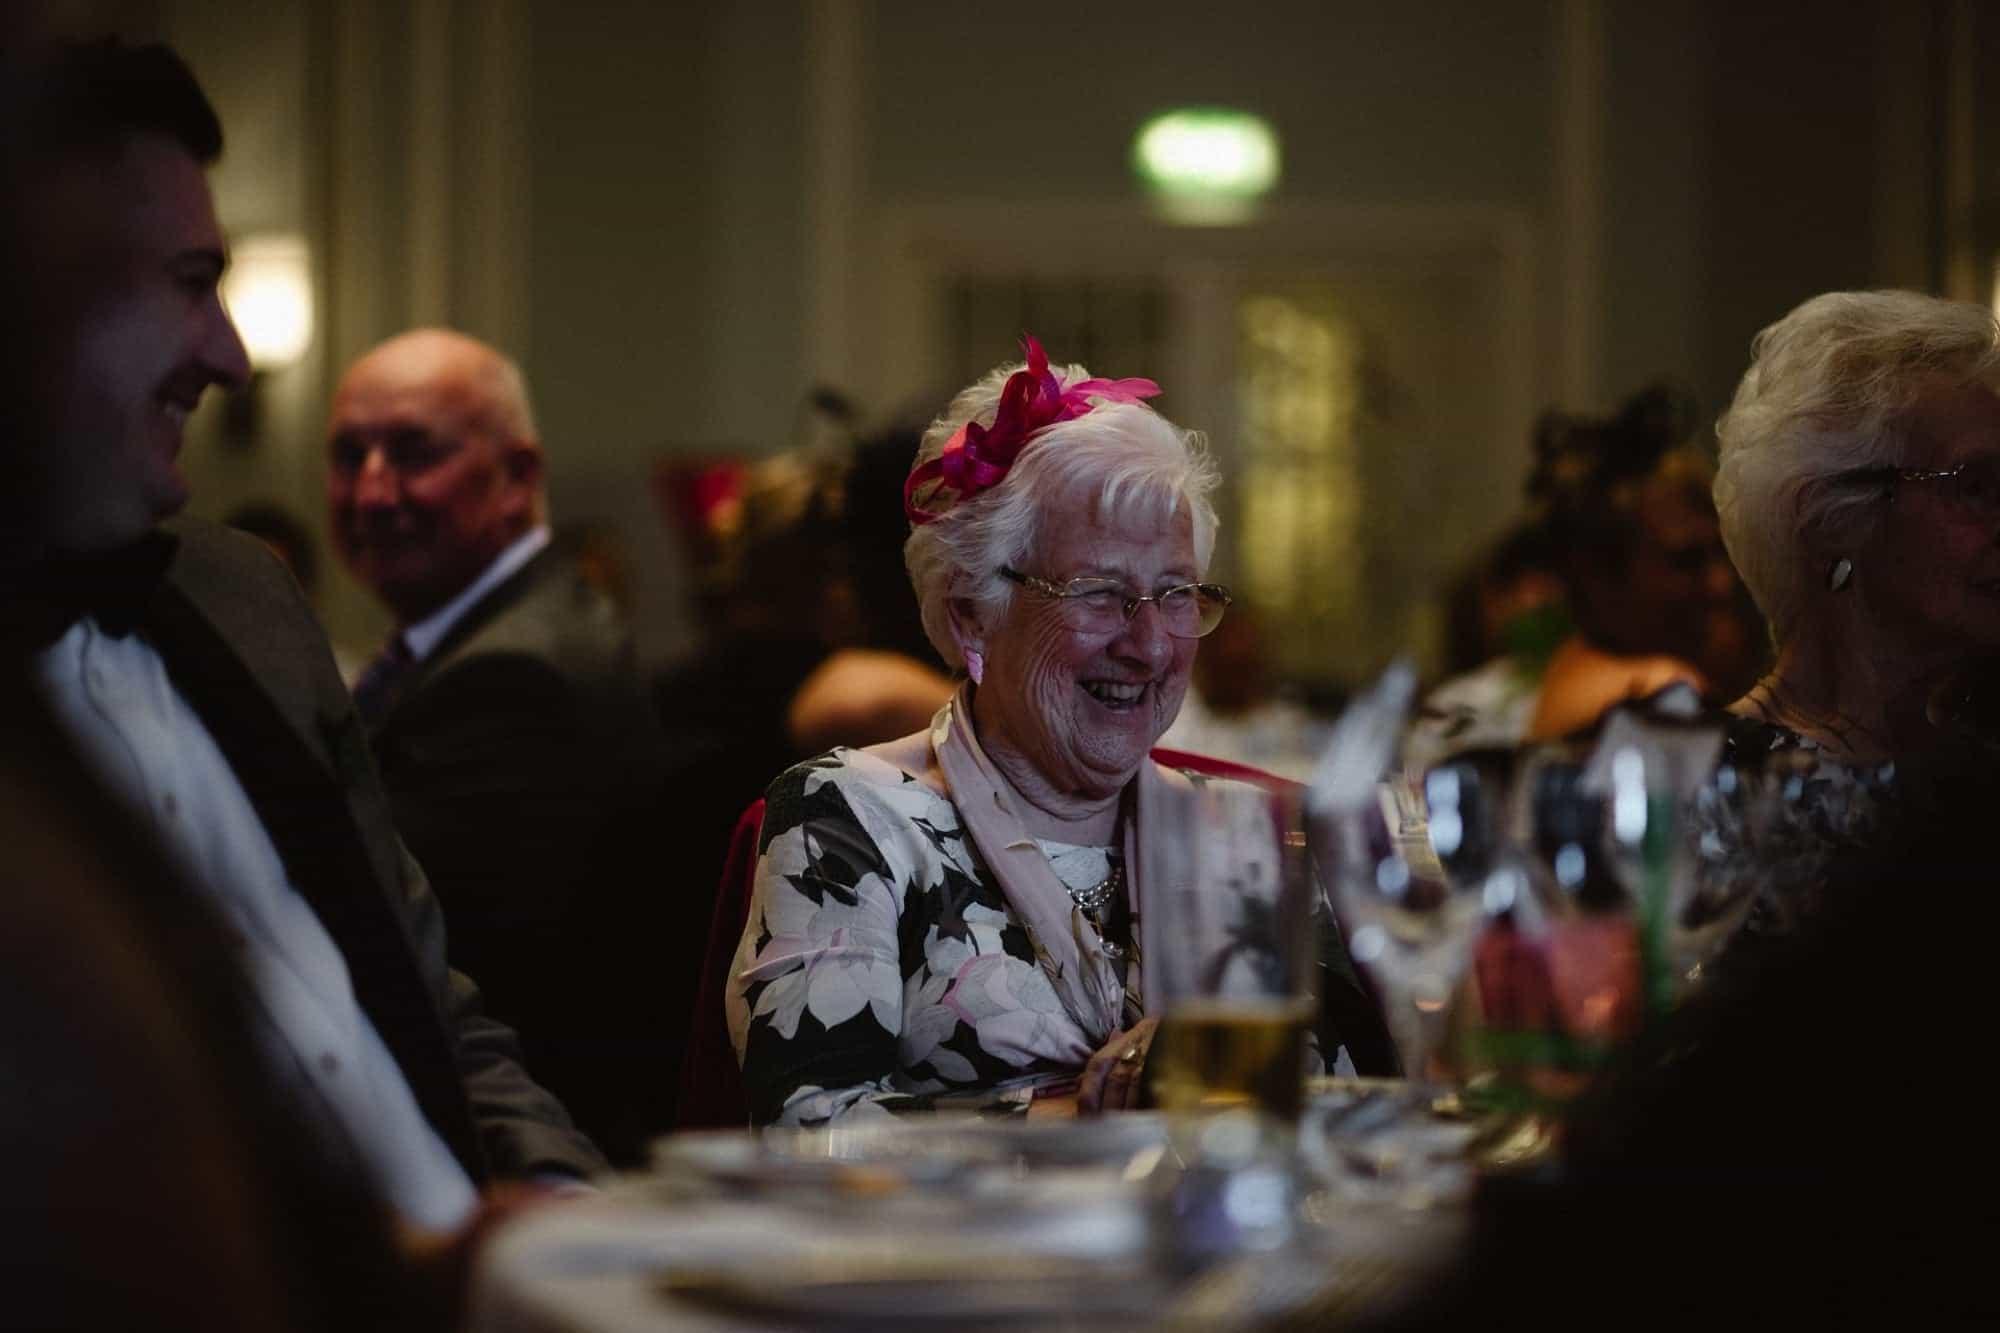 Grandma laughing during wedding speeches